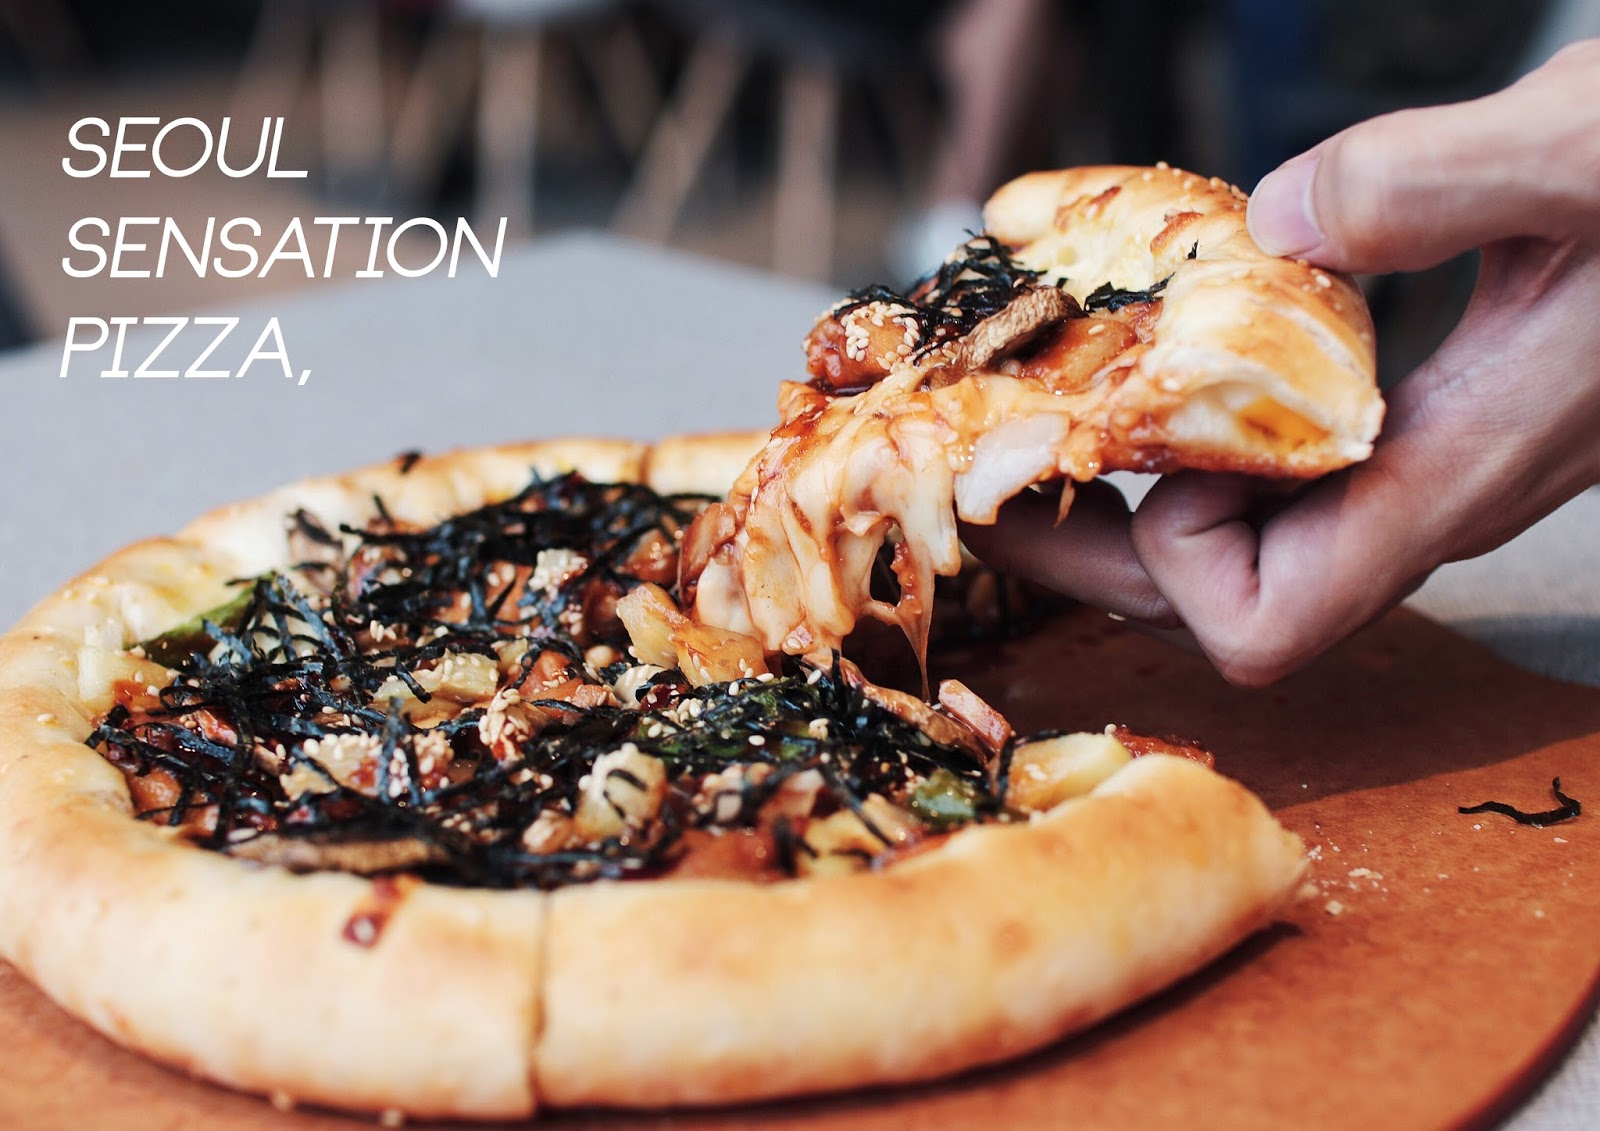 seoul sensation pizza, pizza hut, price